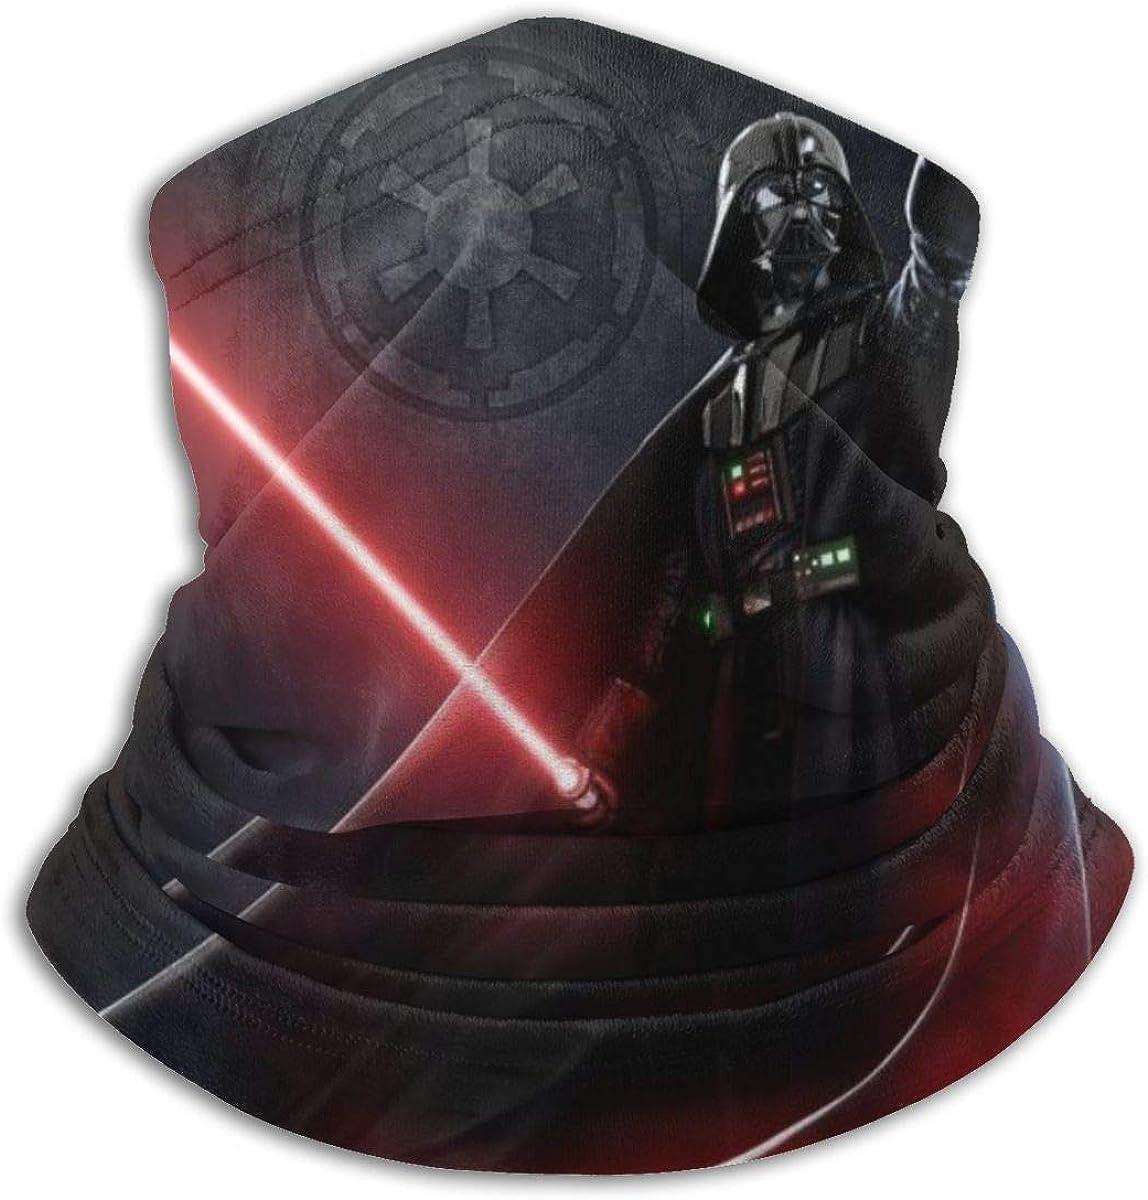 Star War Darth Vader Neck Warmer Scarf Unisex Soft Windproof Novelty Headband For Sports Hiking